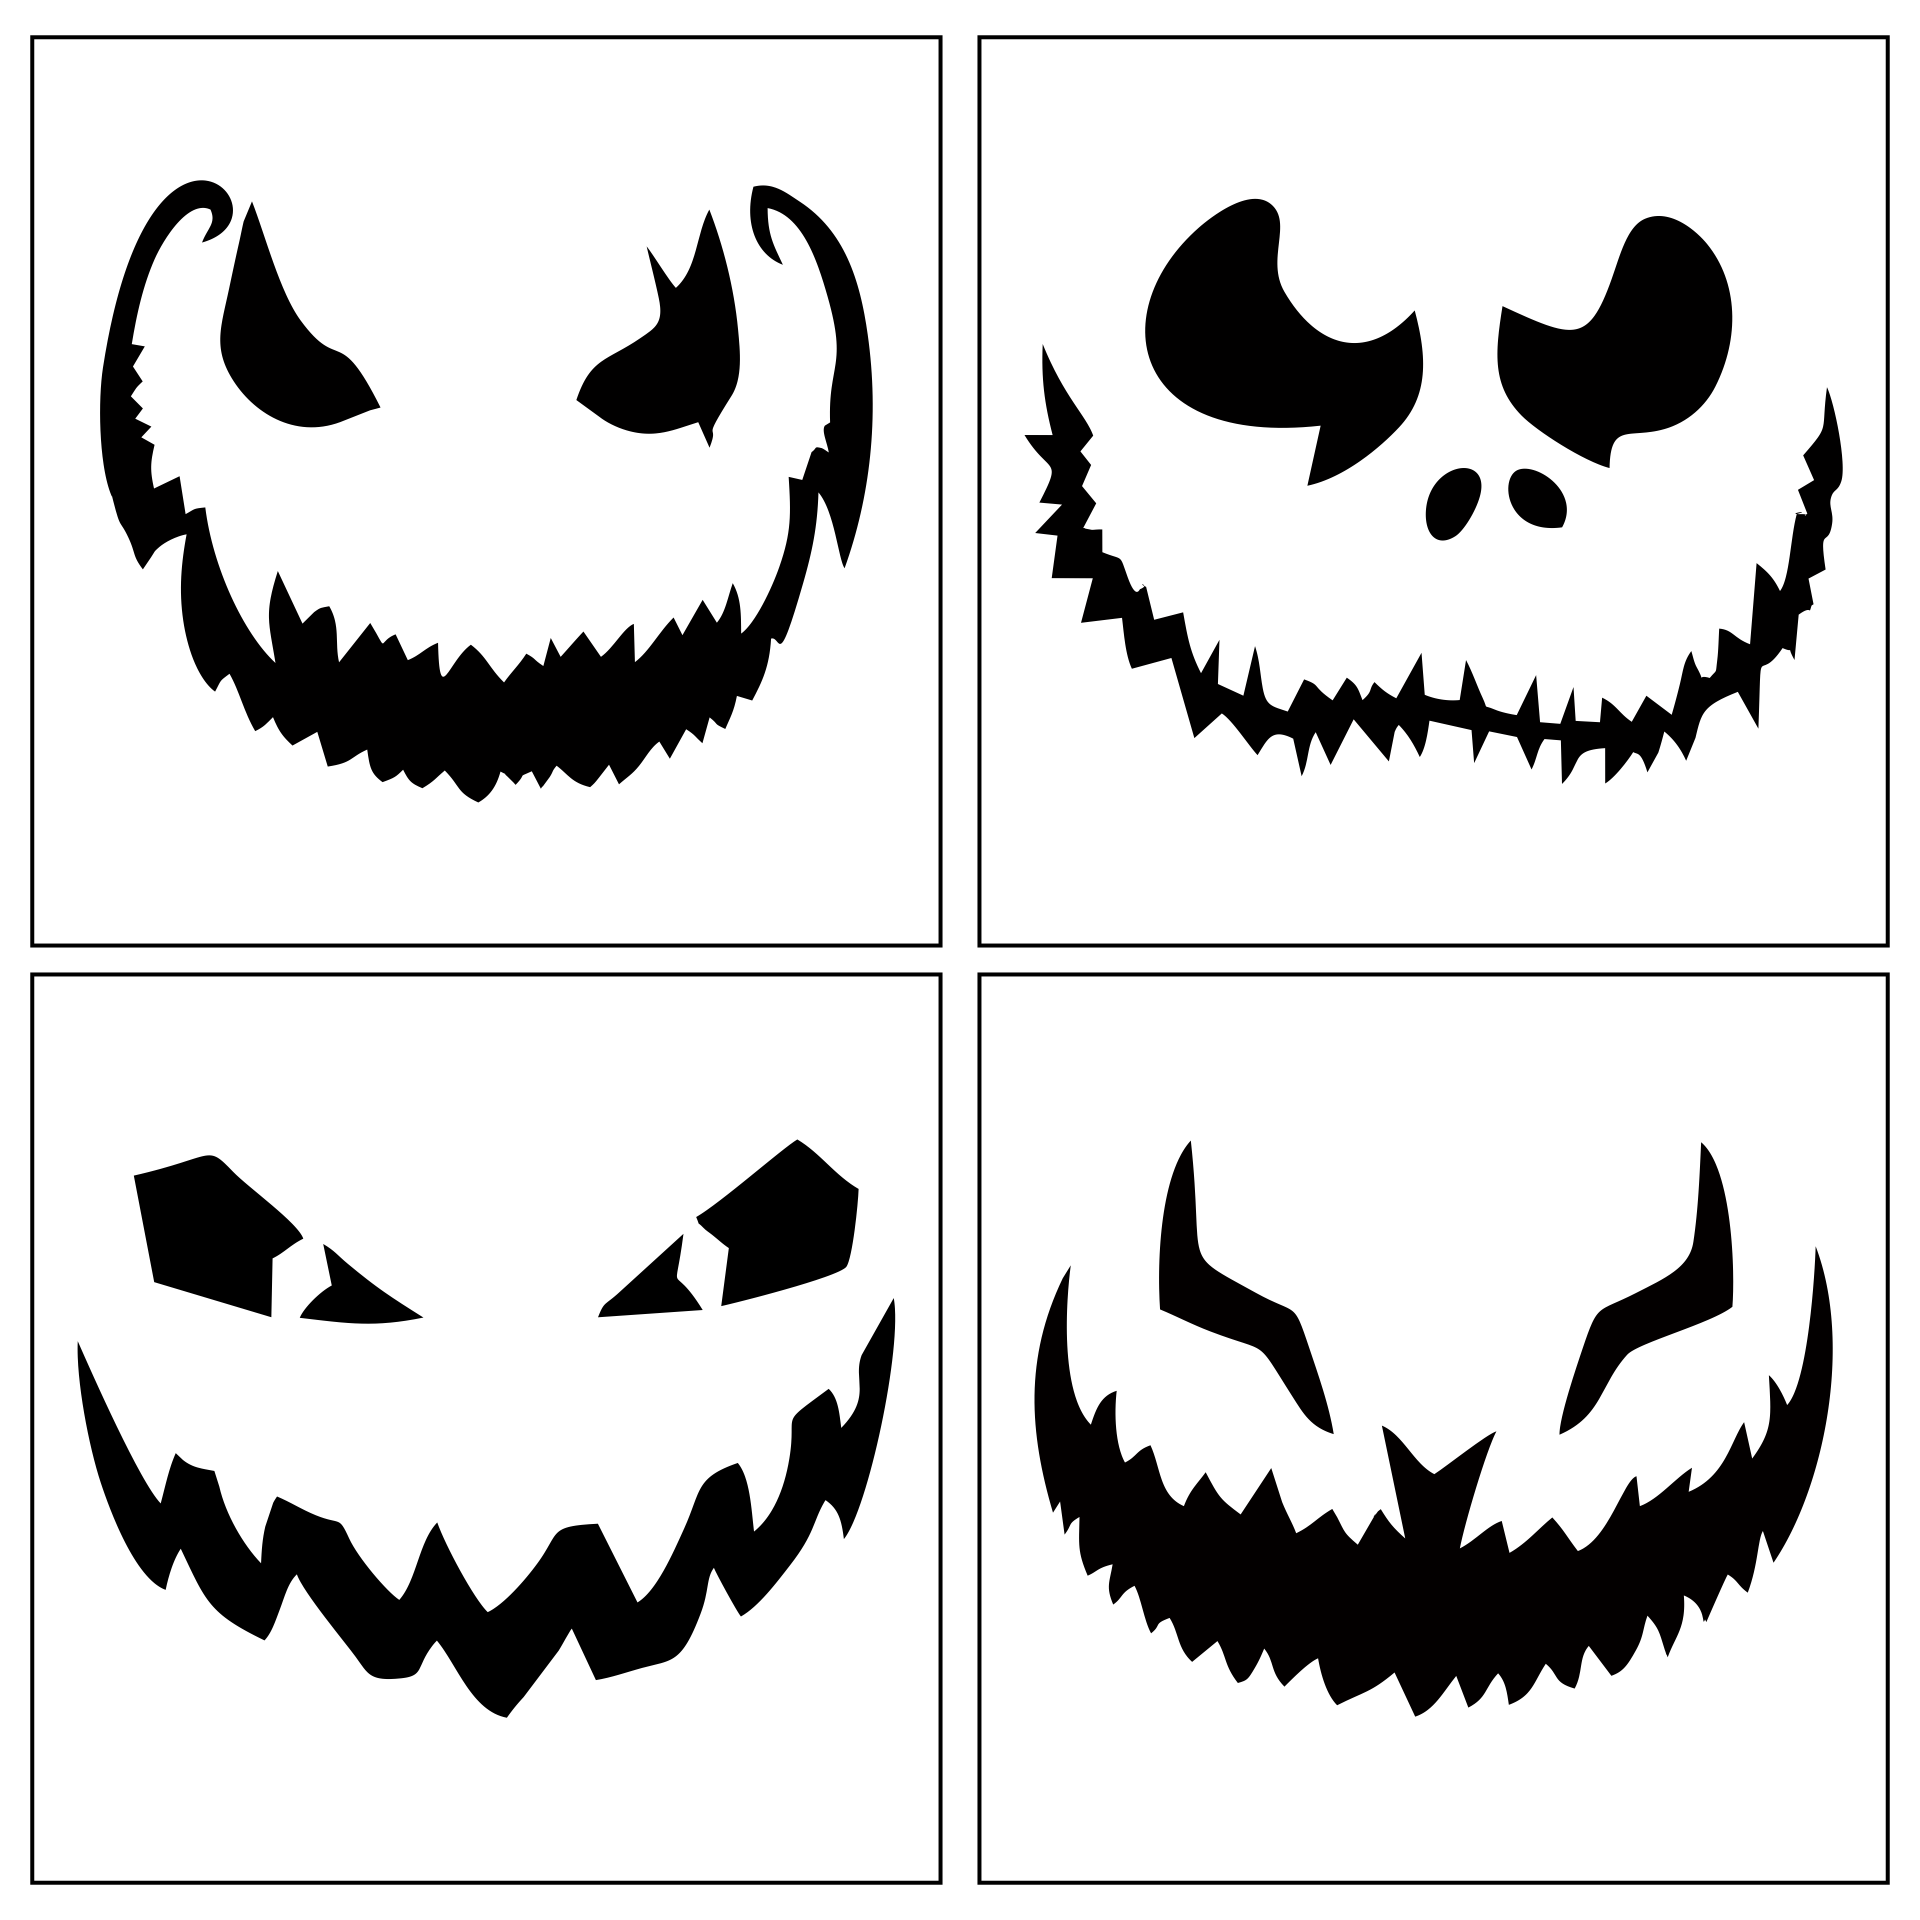 Printable Halloween Pumpkin Carving Designs